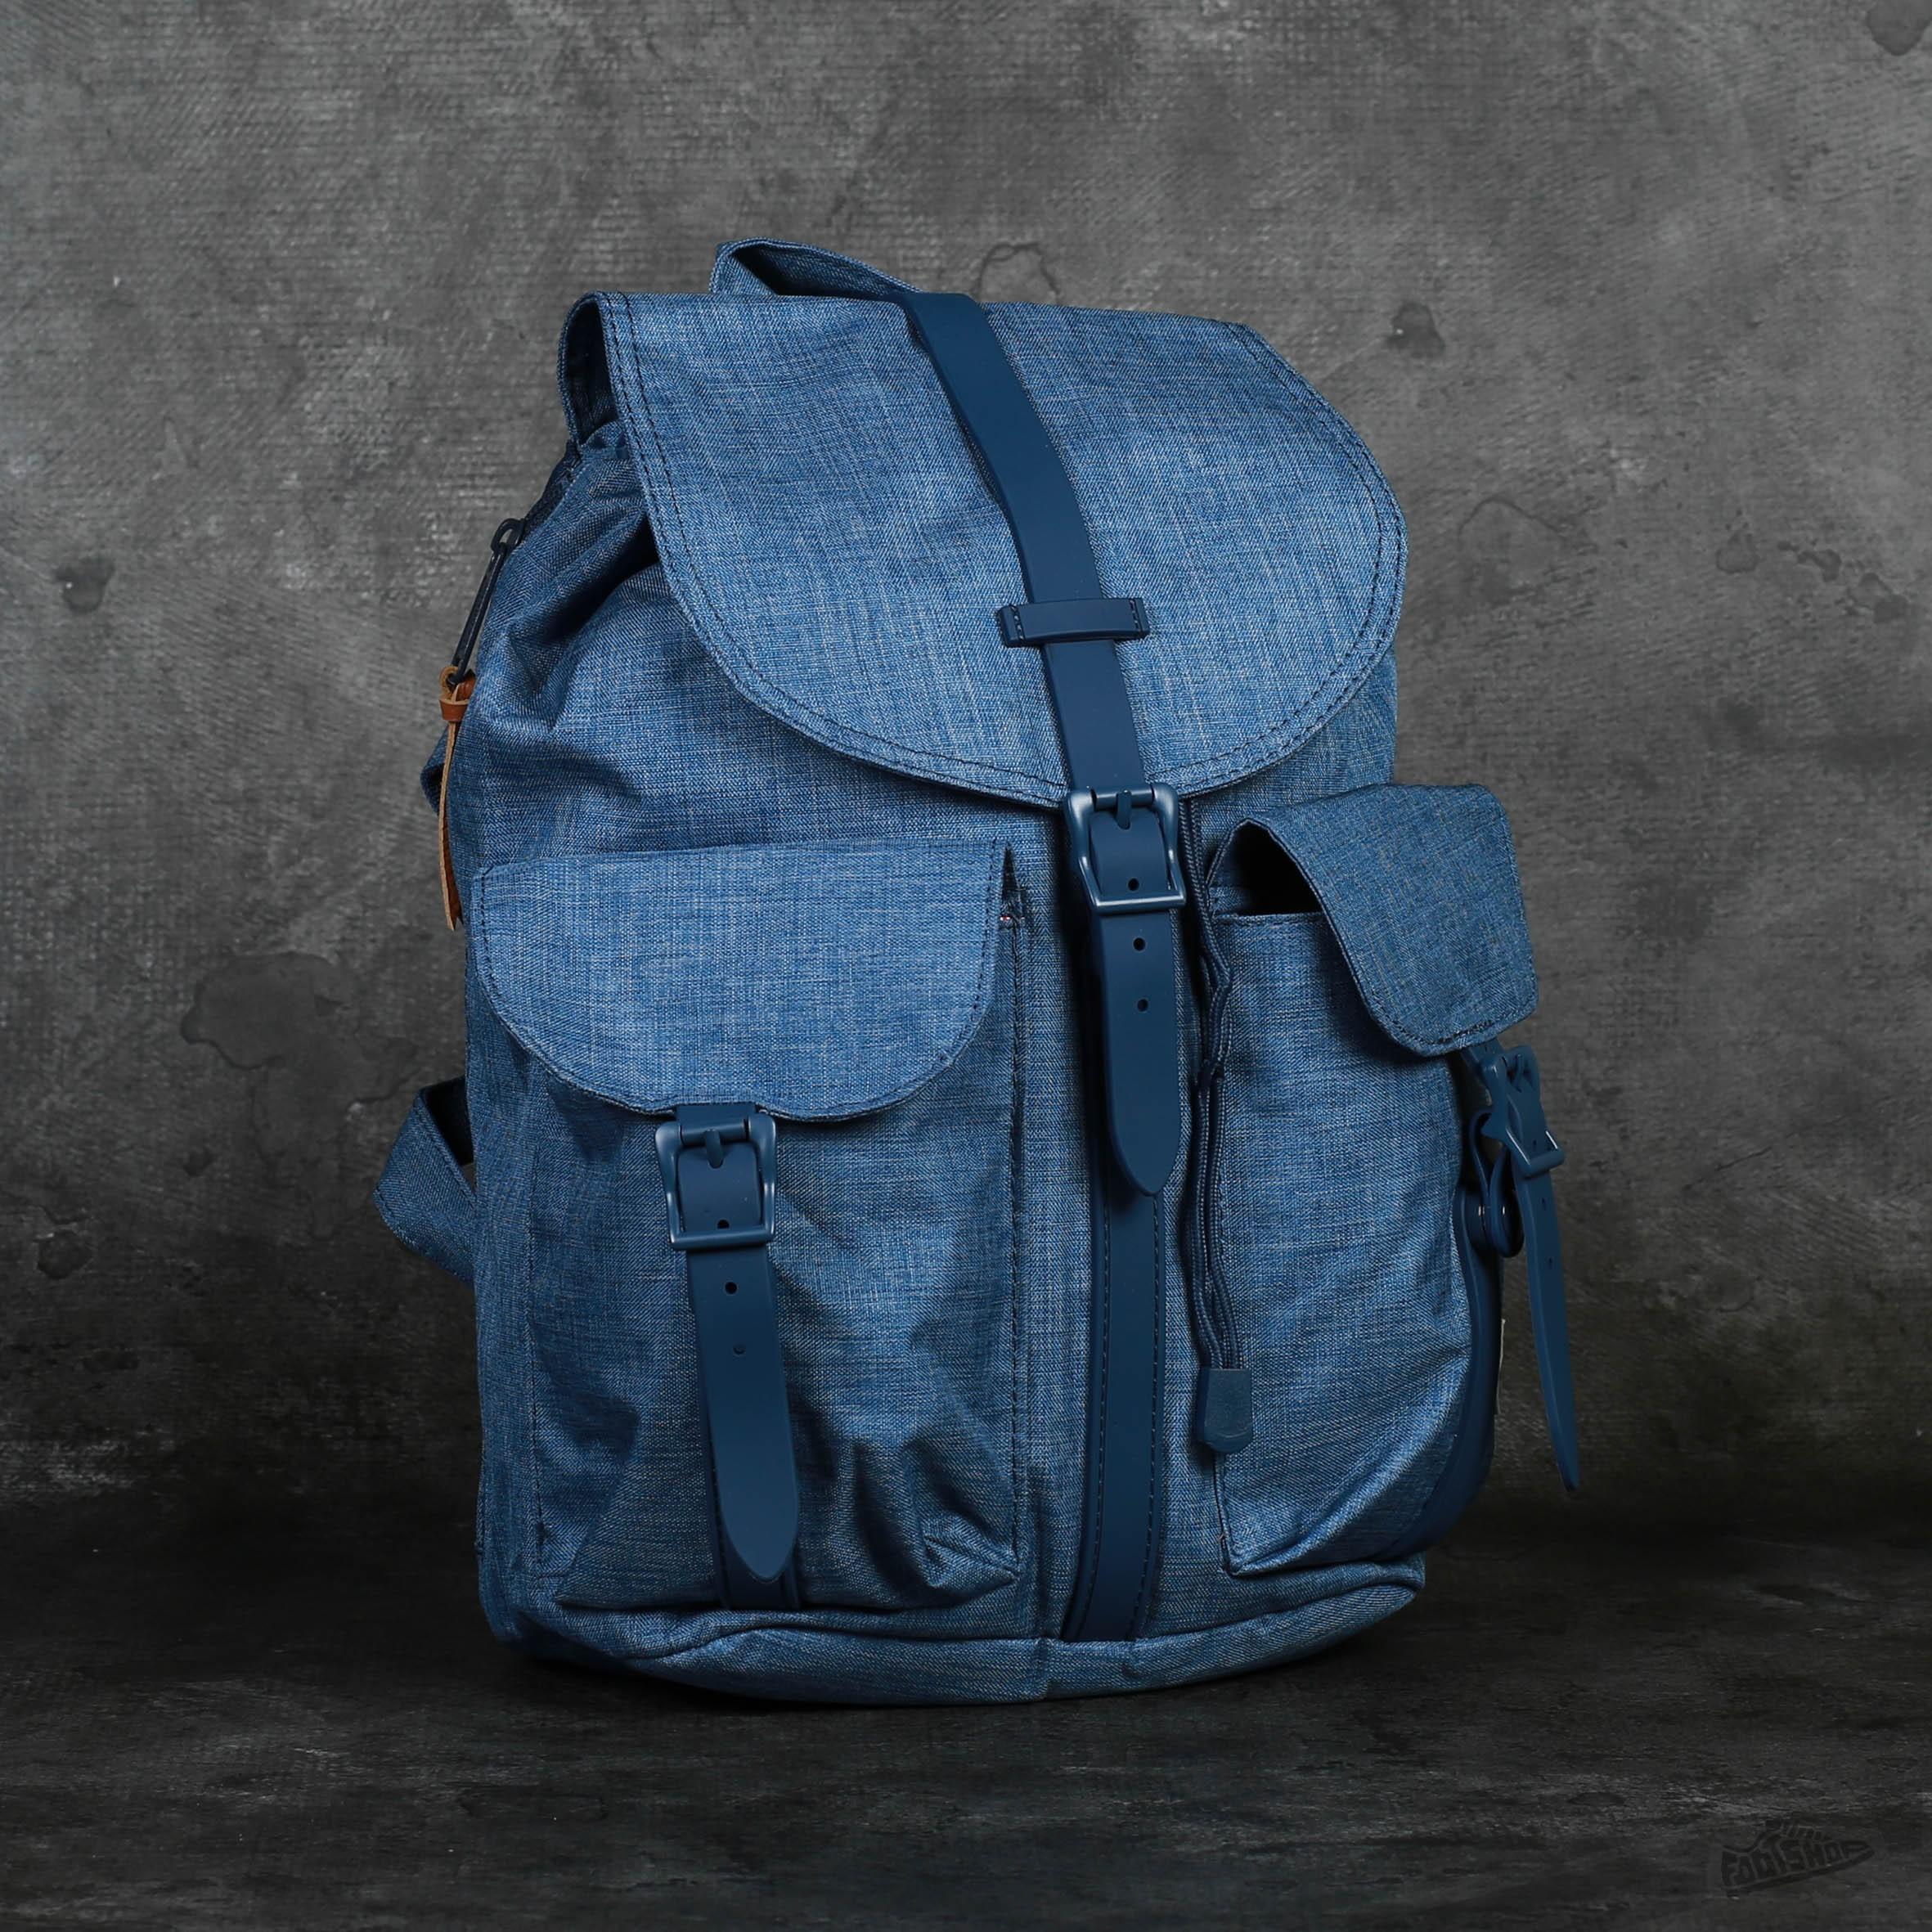 b0f05e2adc3 Herschel Supply Co. Dawson Backpack Classics Navy